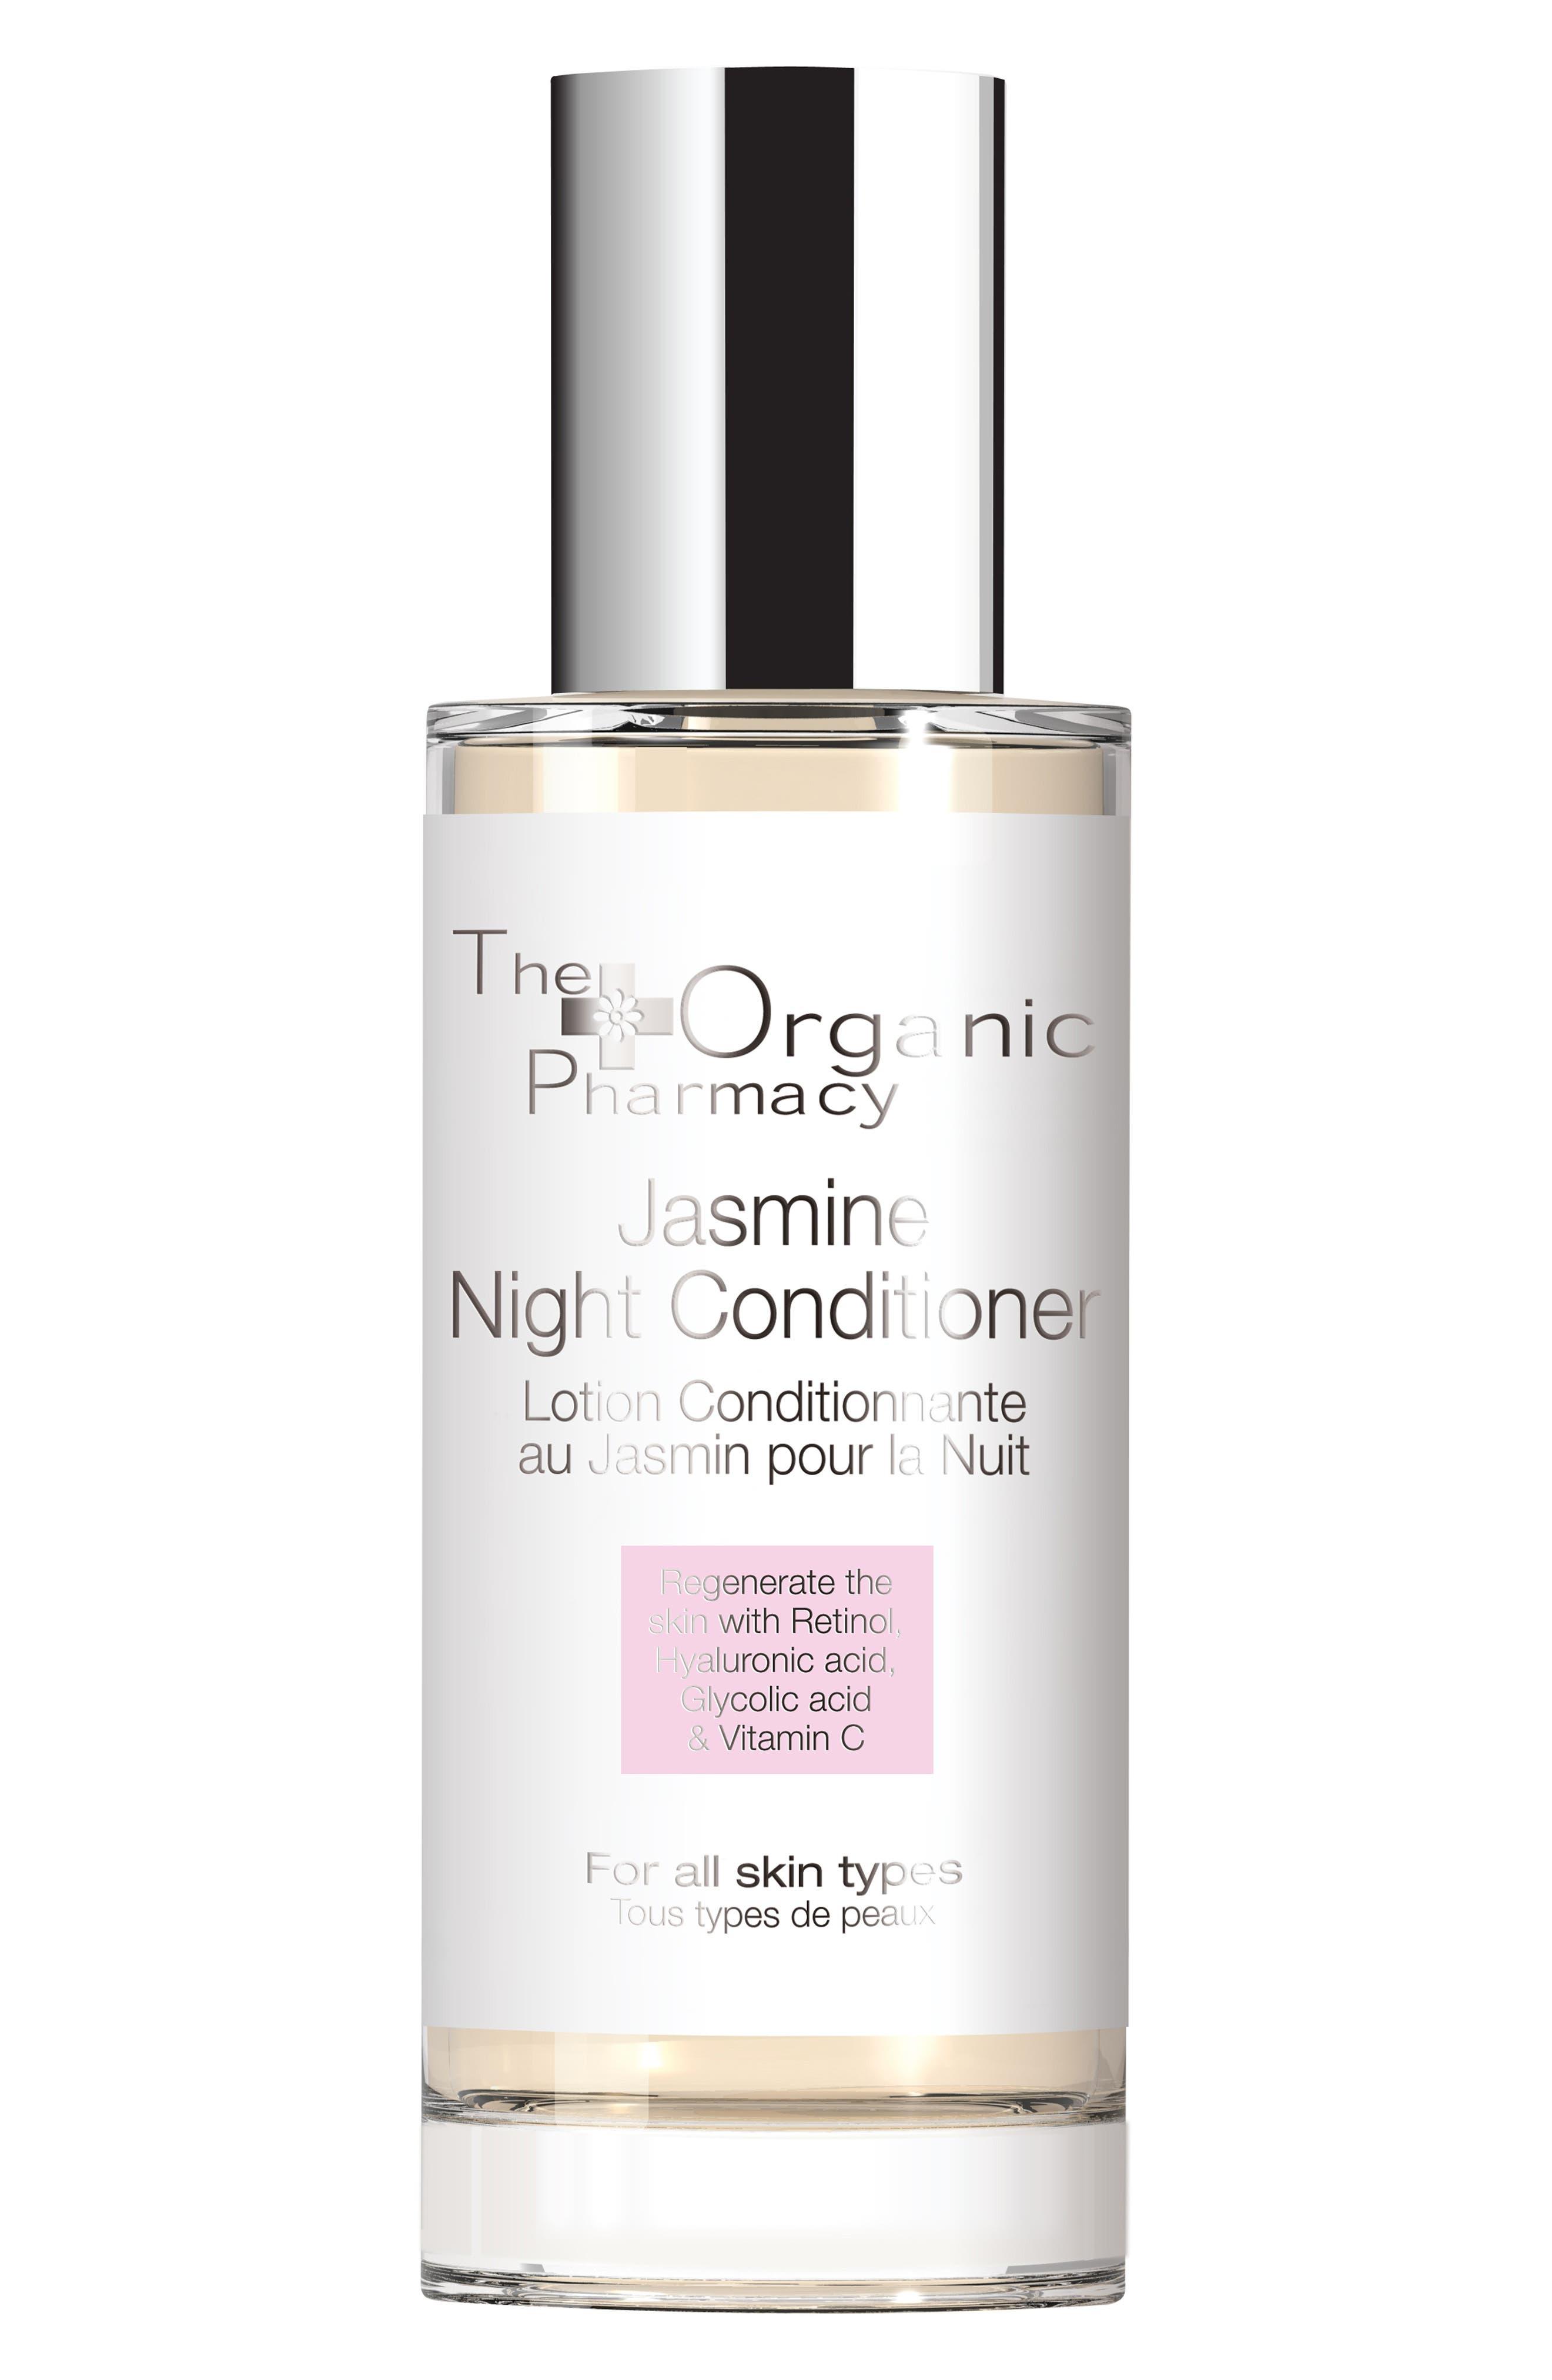 The Organic Pharmacy Jasmine Night Conditioning Spray